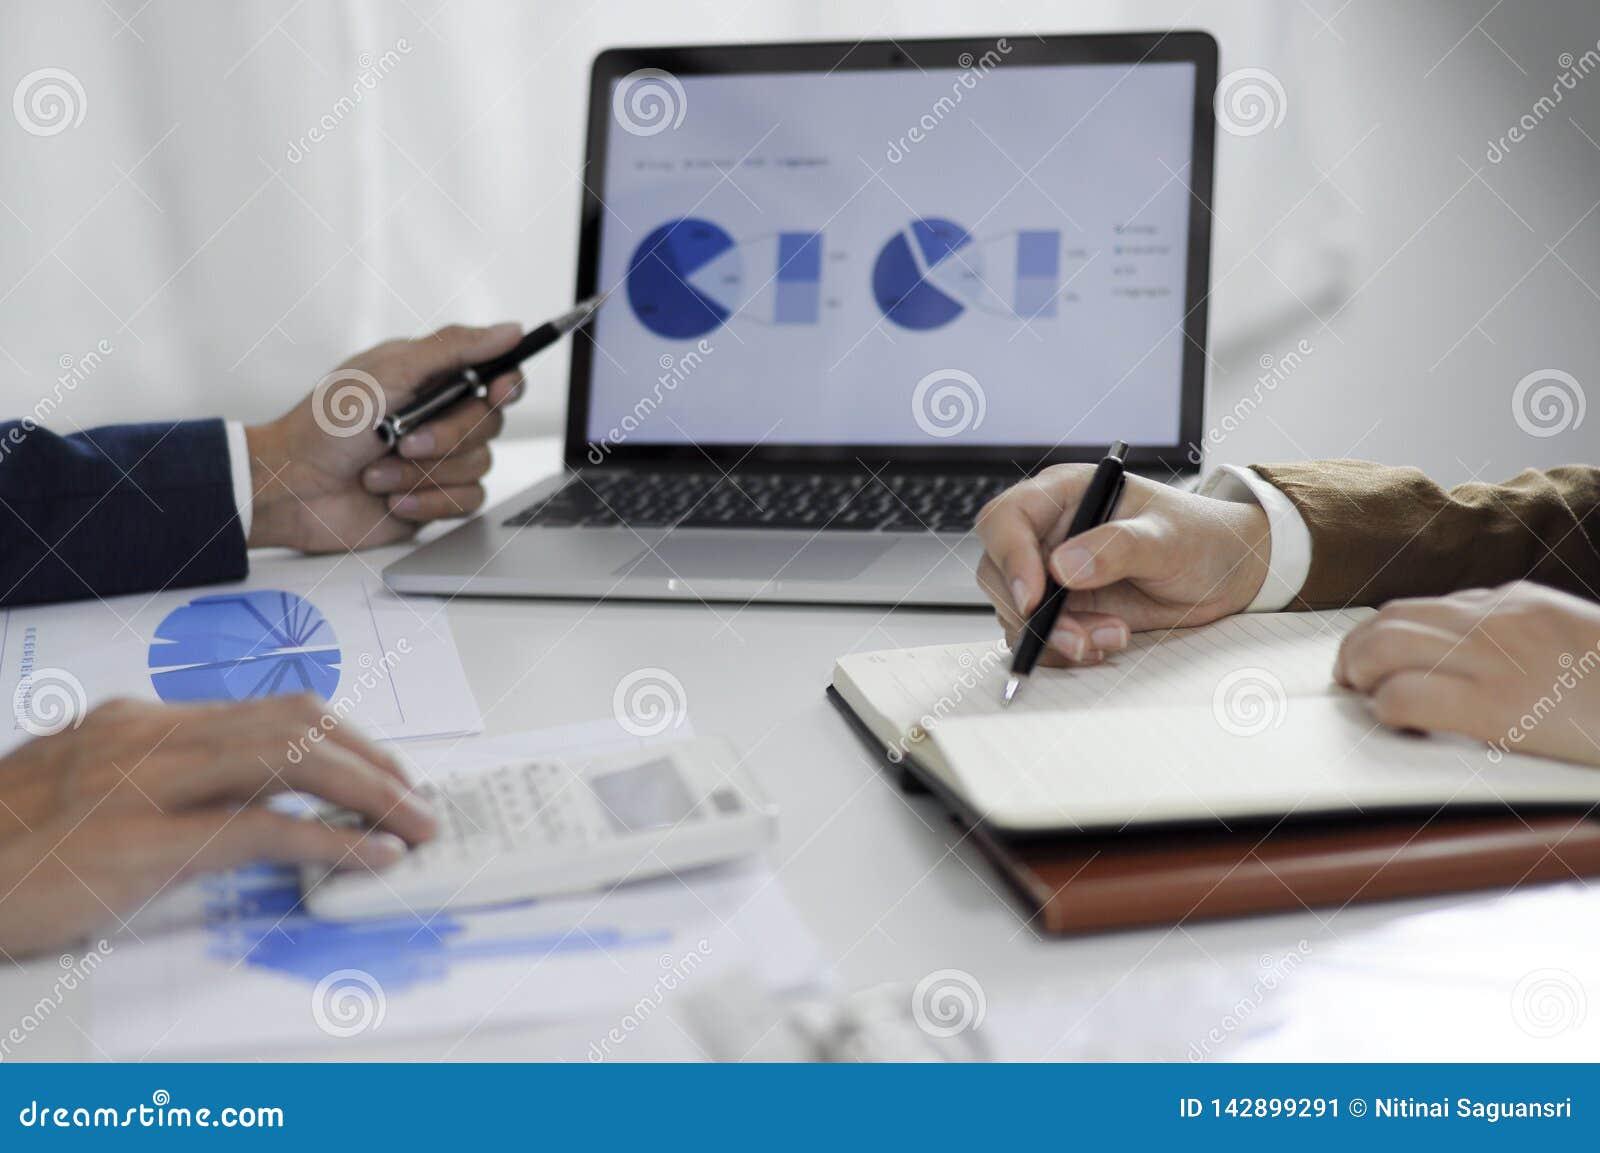 Betriebsberatung, Arbeit, Rat, revidierend